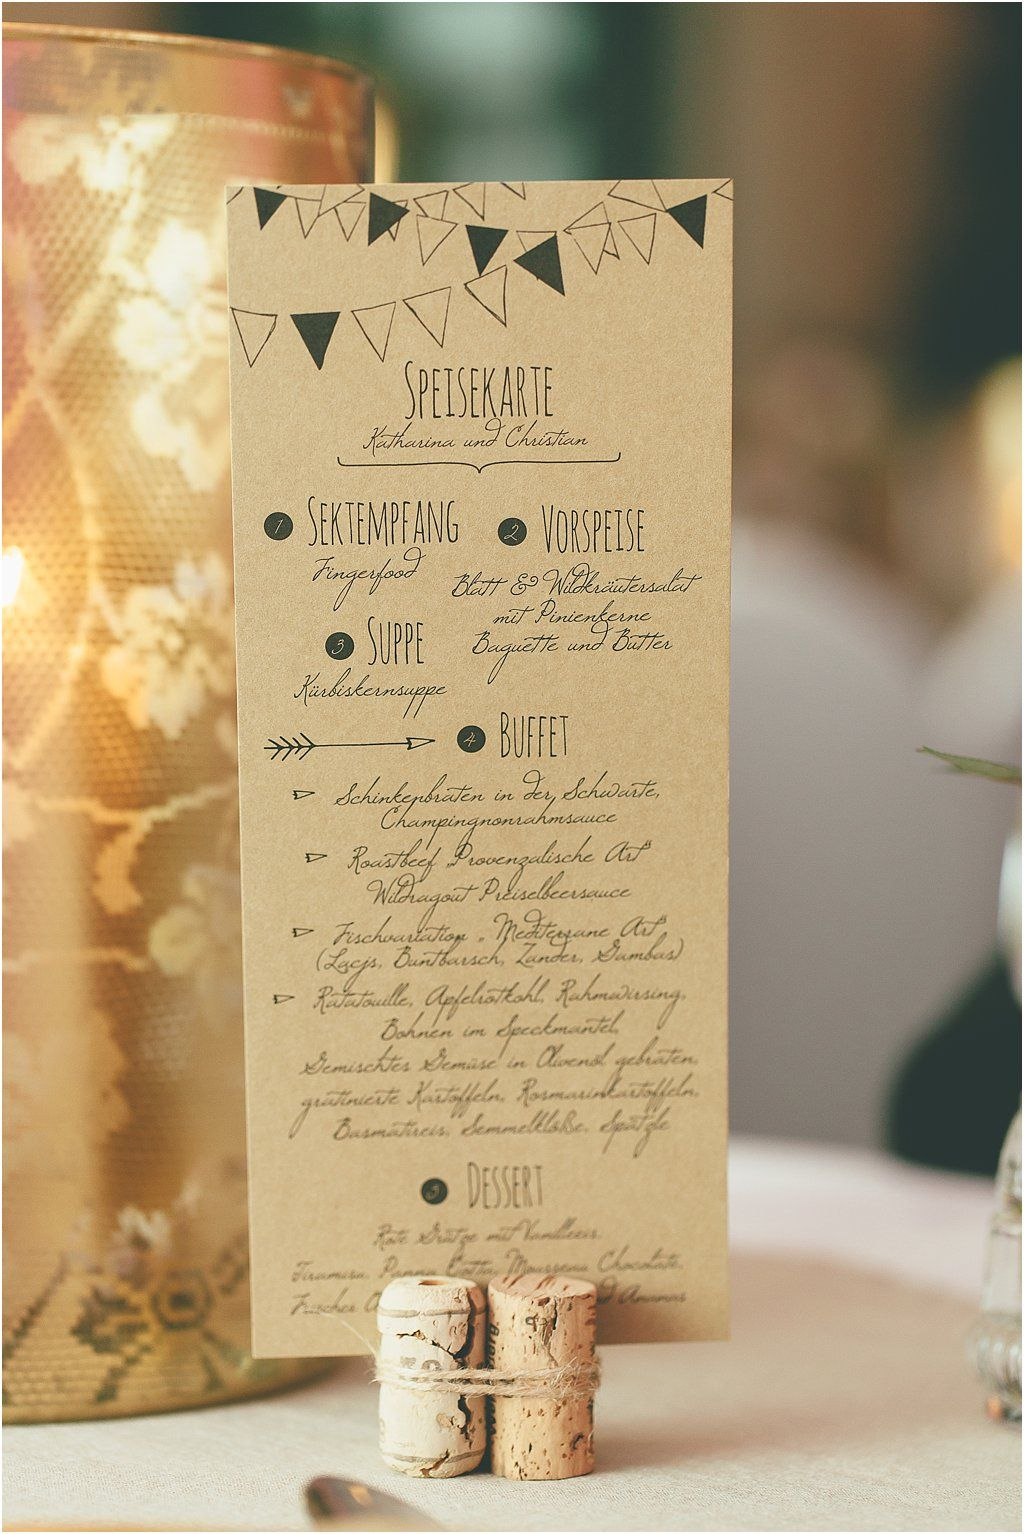 Papeterie Braunes Papier  Bohemian Style Design Anmut